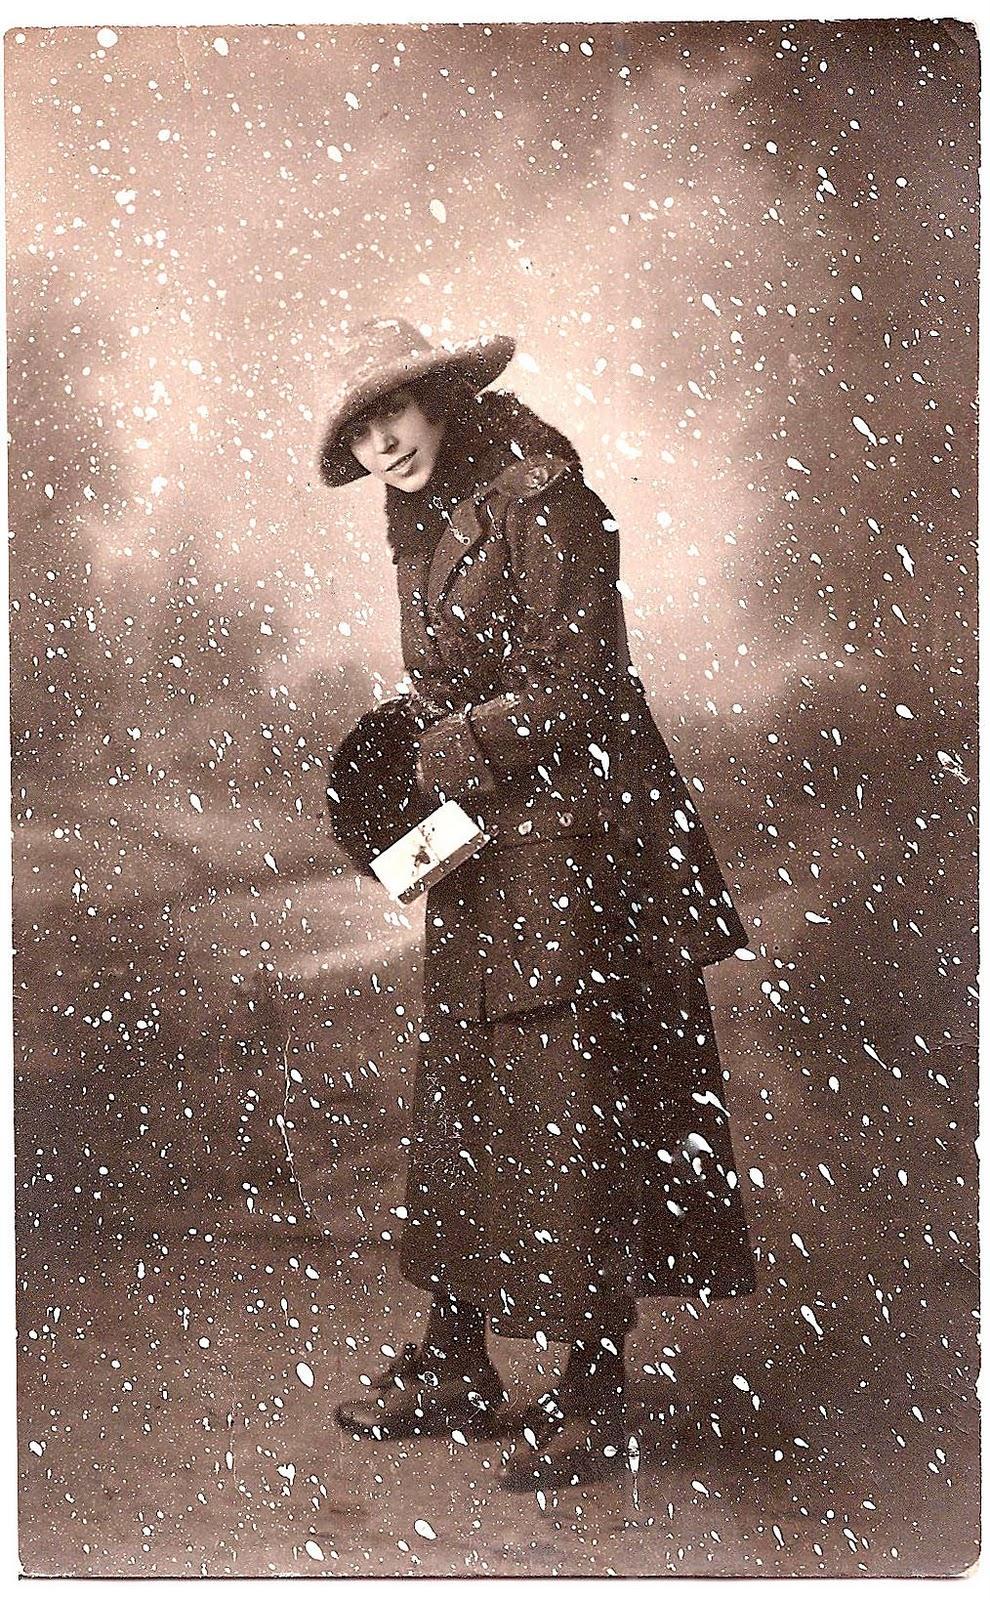 Old Photo Woman In Snow Scene Winter